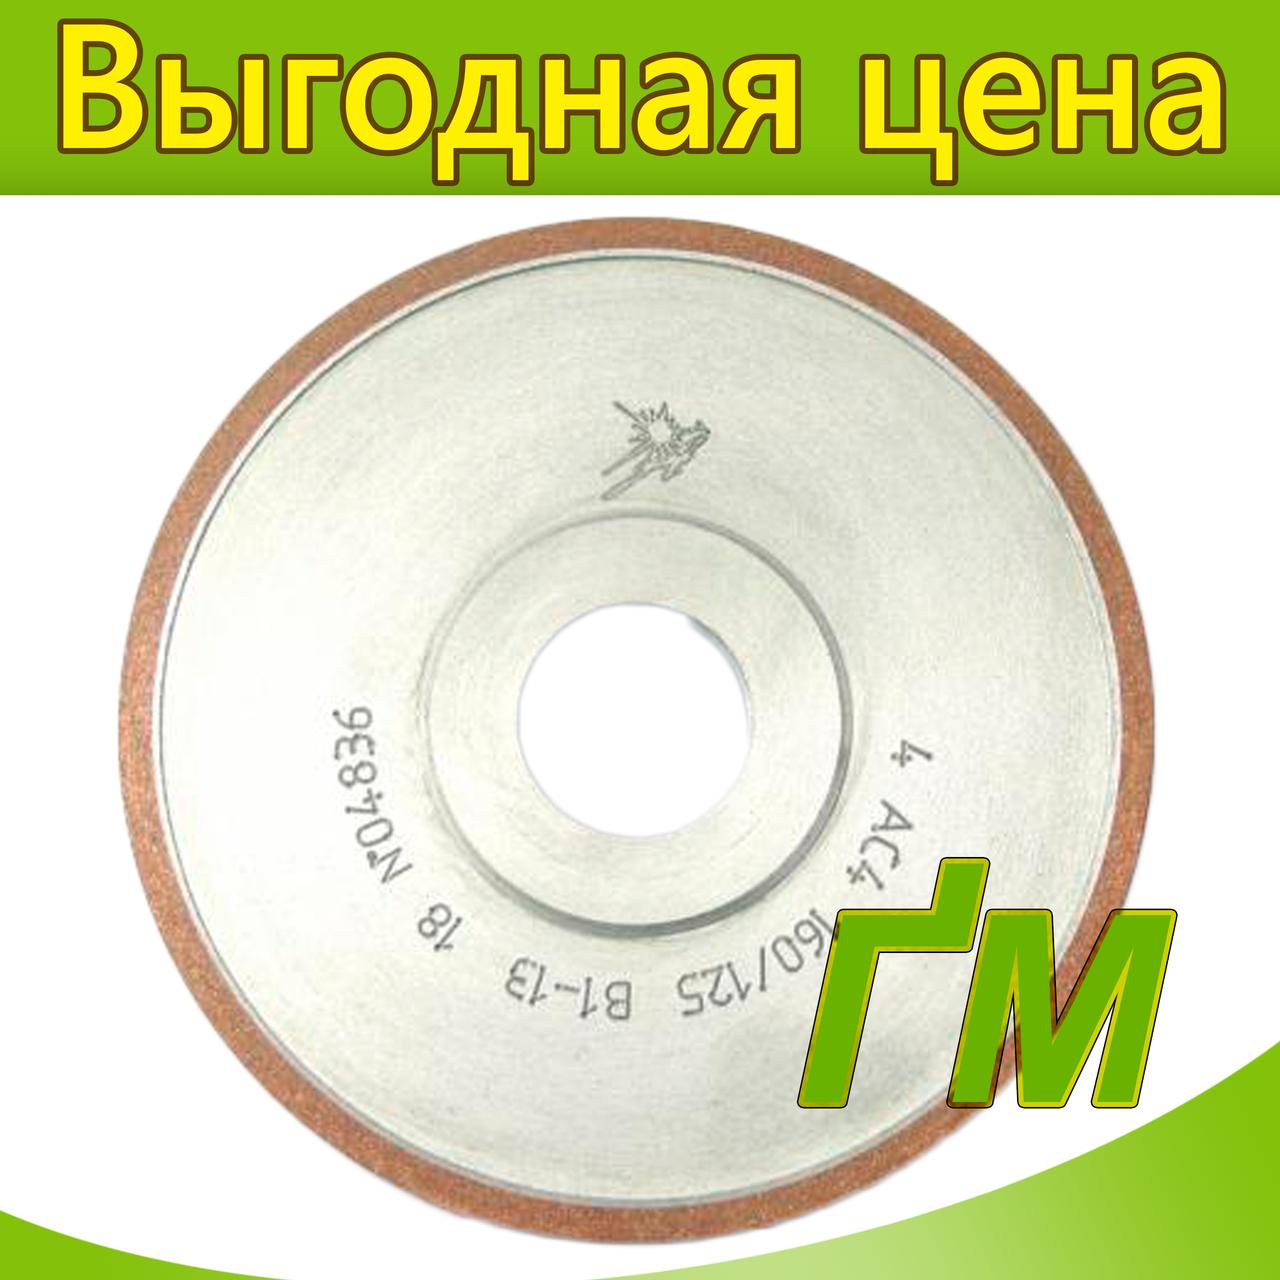 Круг алмазный плоский ПП 1А1 Ф 200х10х5х76 АС 80/63 100% В2-01